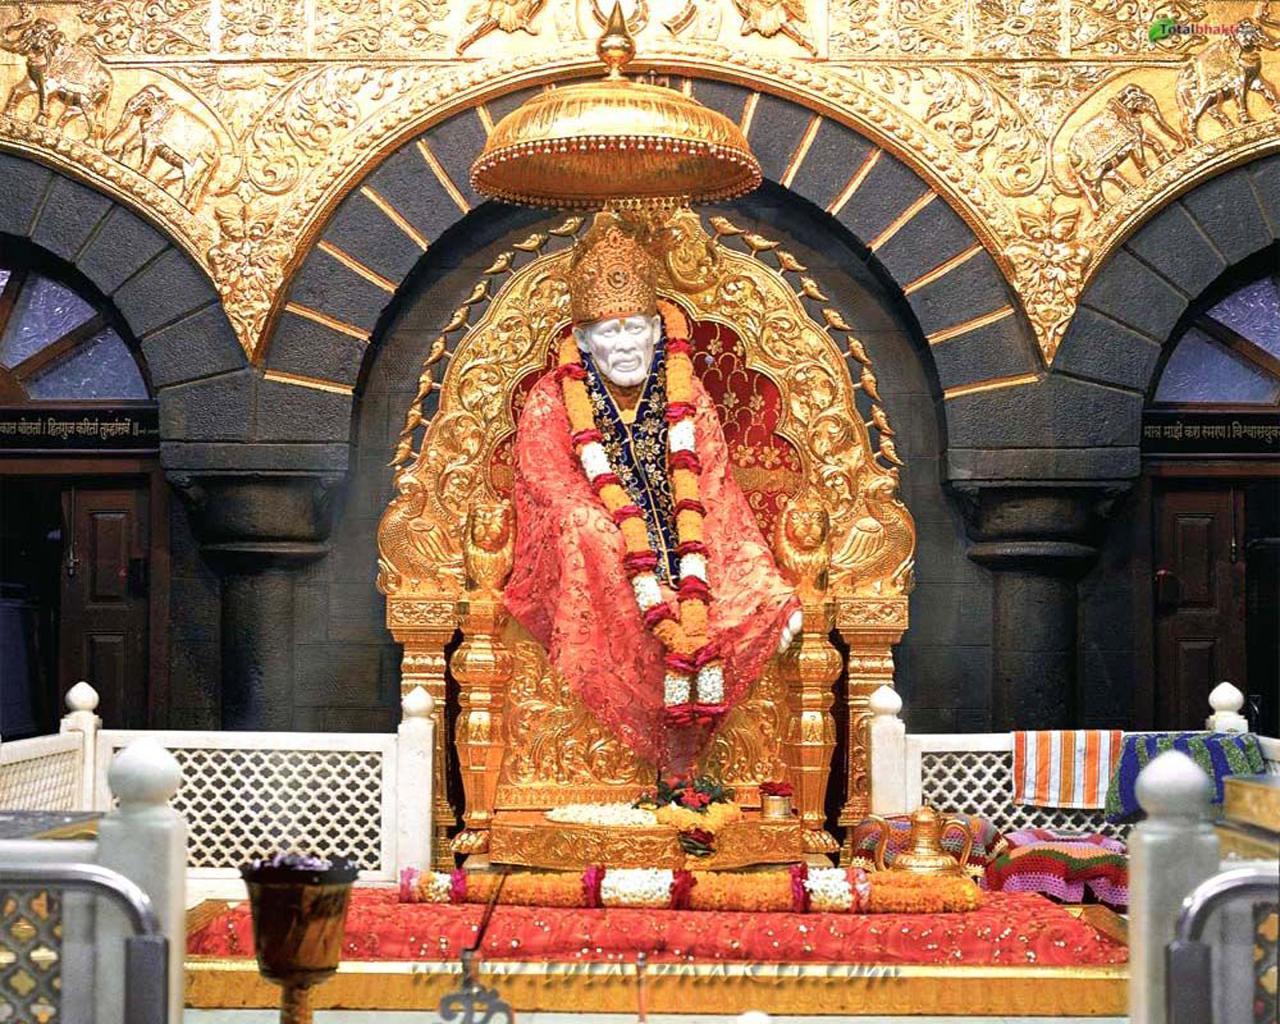 Shridi Sai Baba Hd Wallpapers | Gallery of God